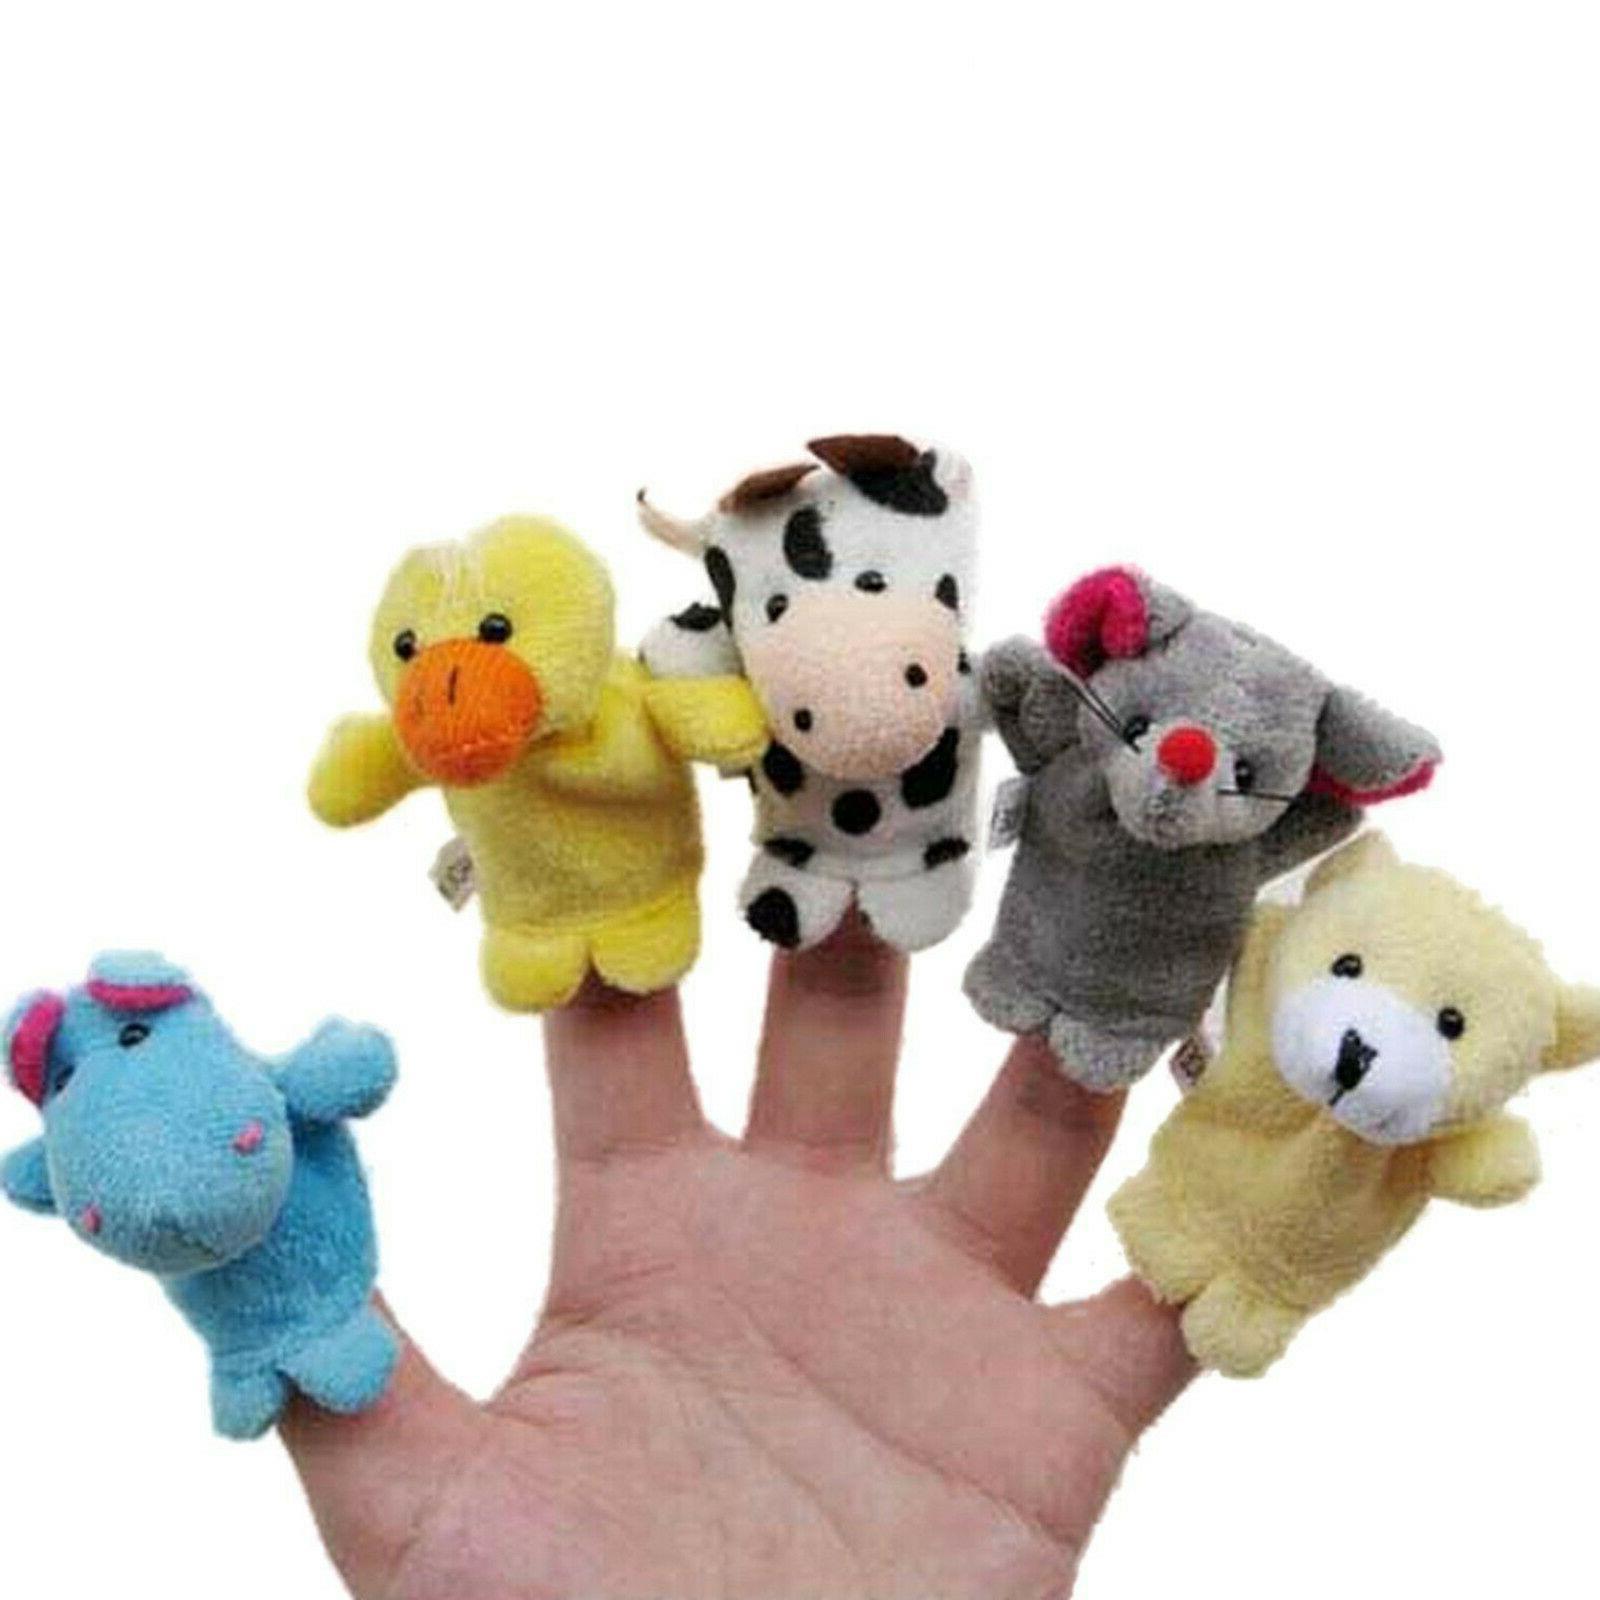 10pcs Toys Cloth Dolls Puppets Developmental Toy